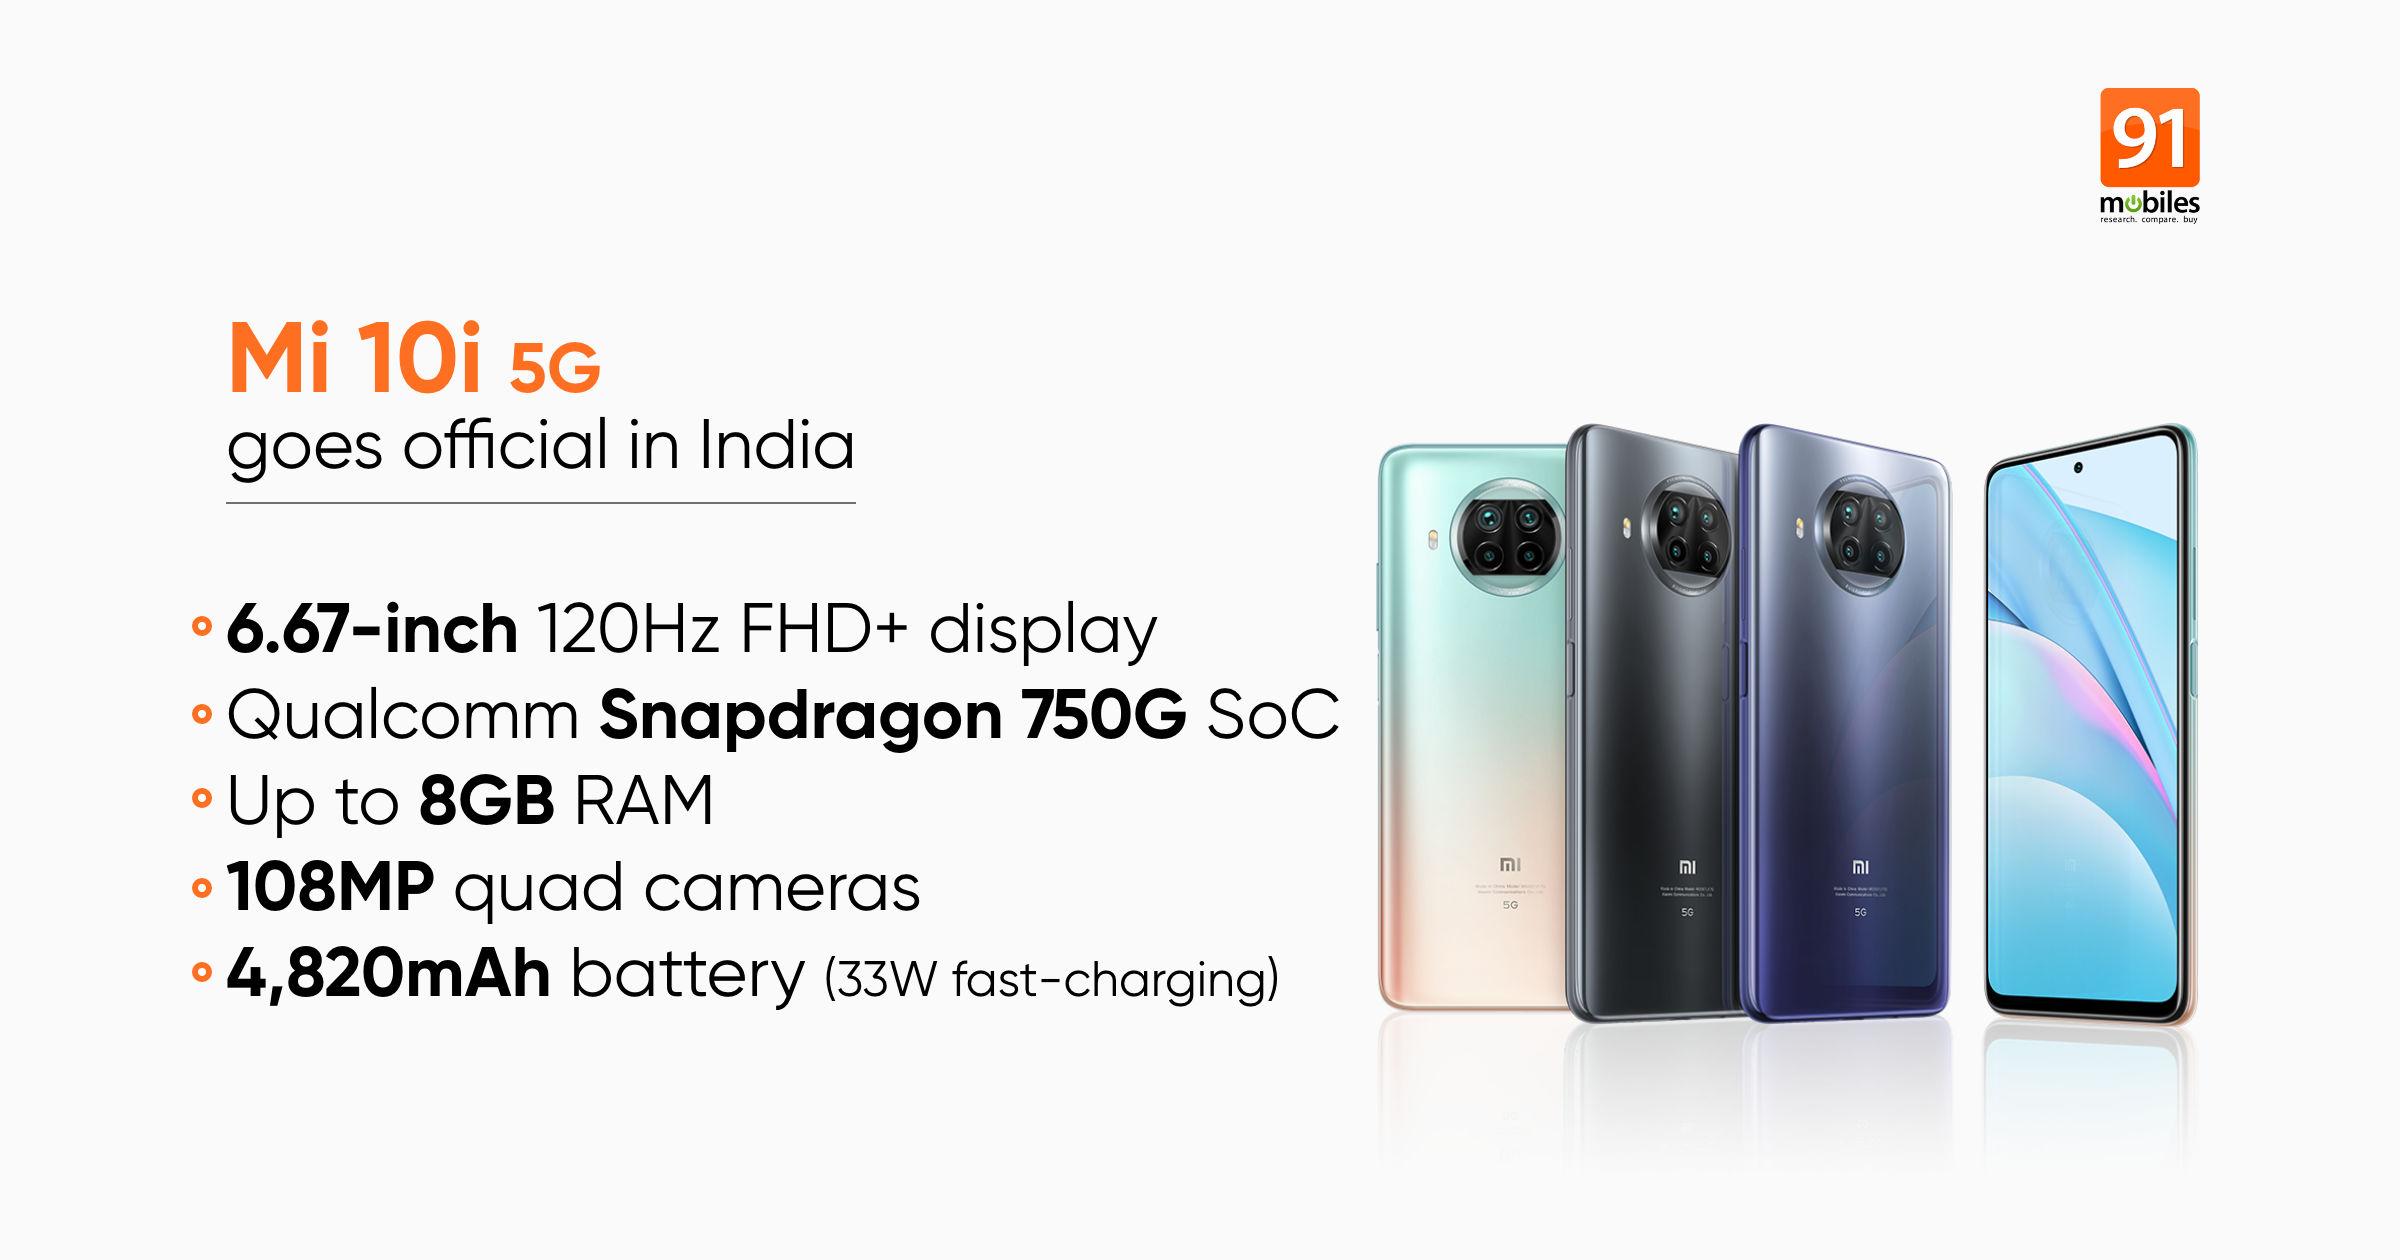 mi 10i india launch feat gama-média, Mi 10i, Notícias, oficial, Portugal, smartphone Android, tecnologia, Xiaomi, Xiaomi Mi 10i